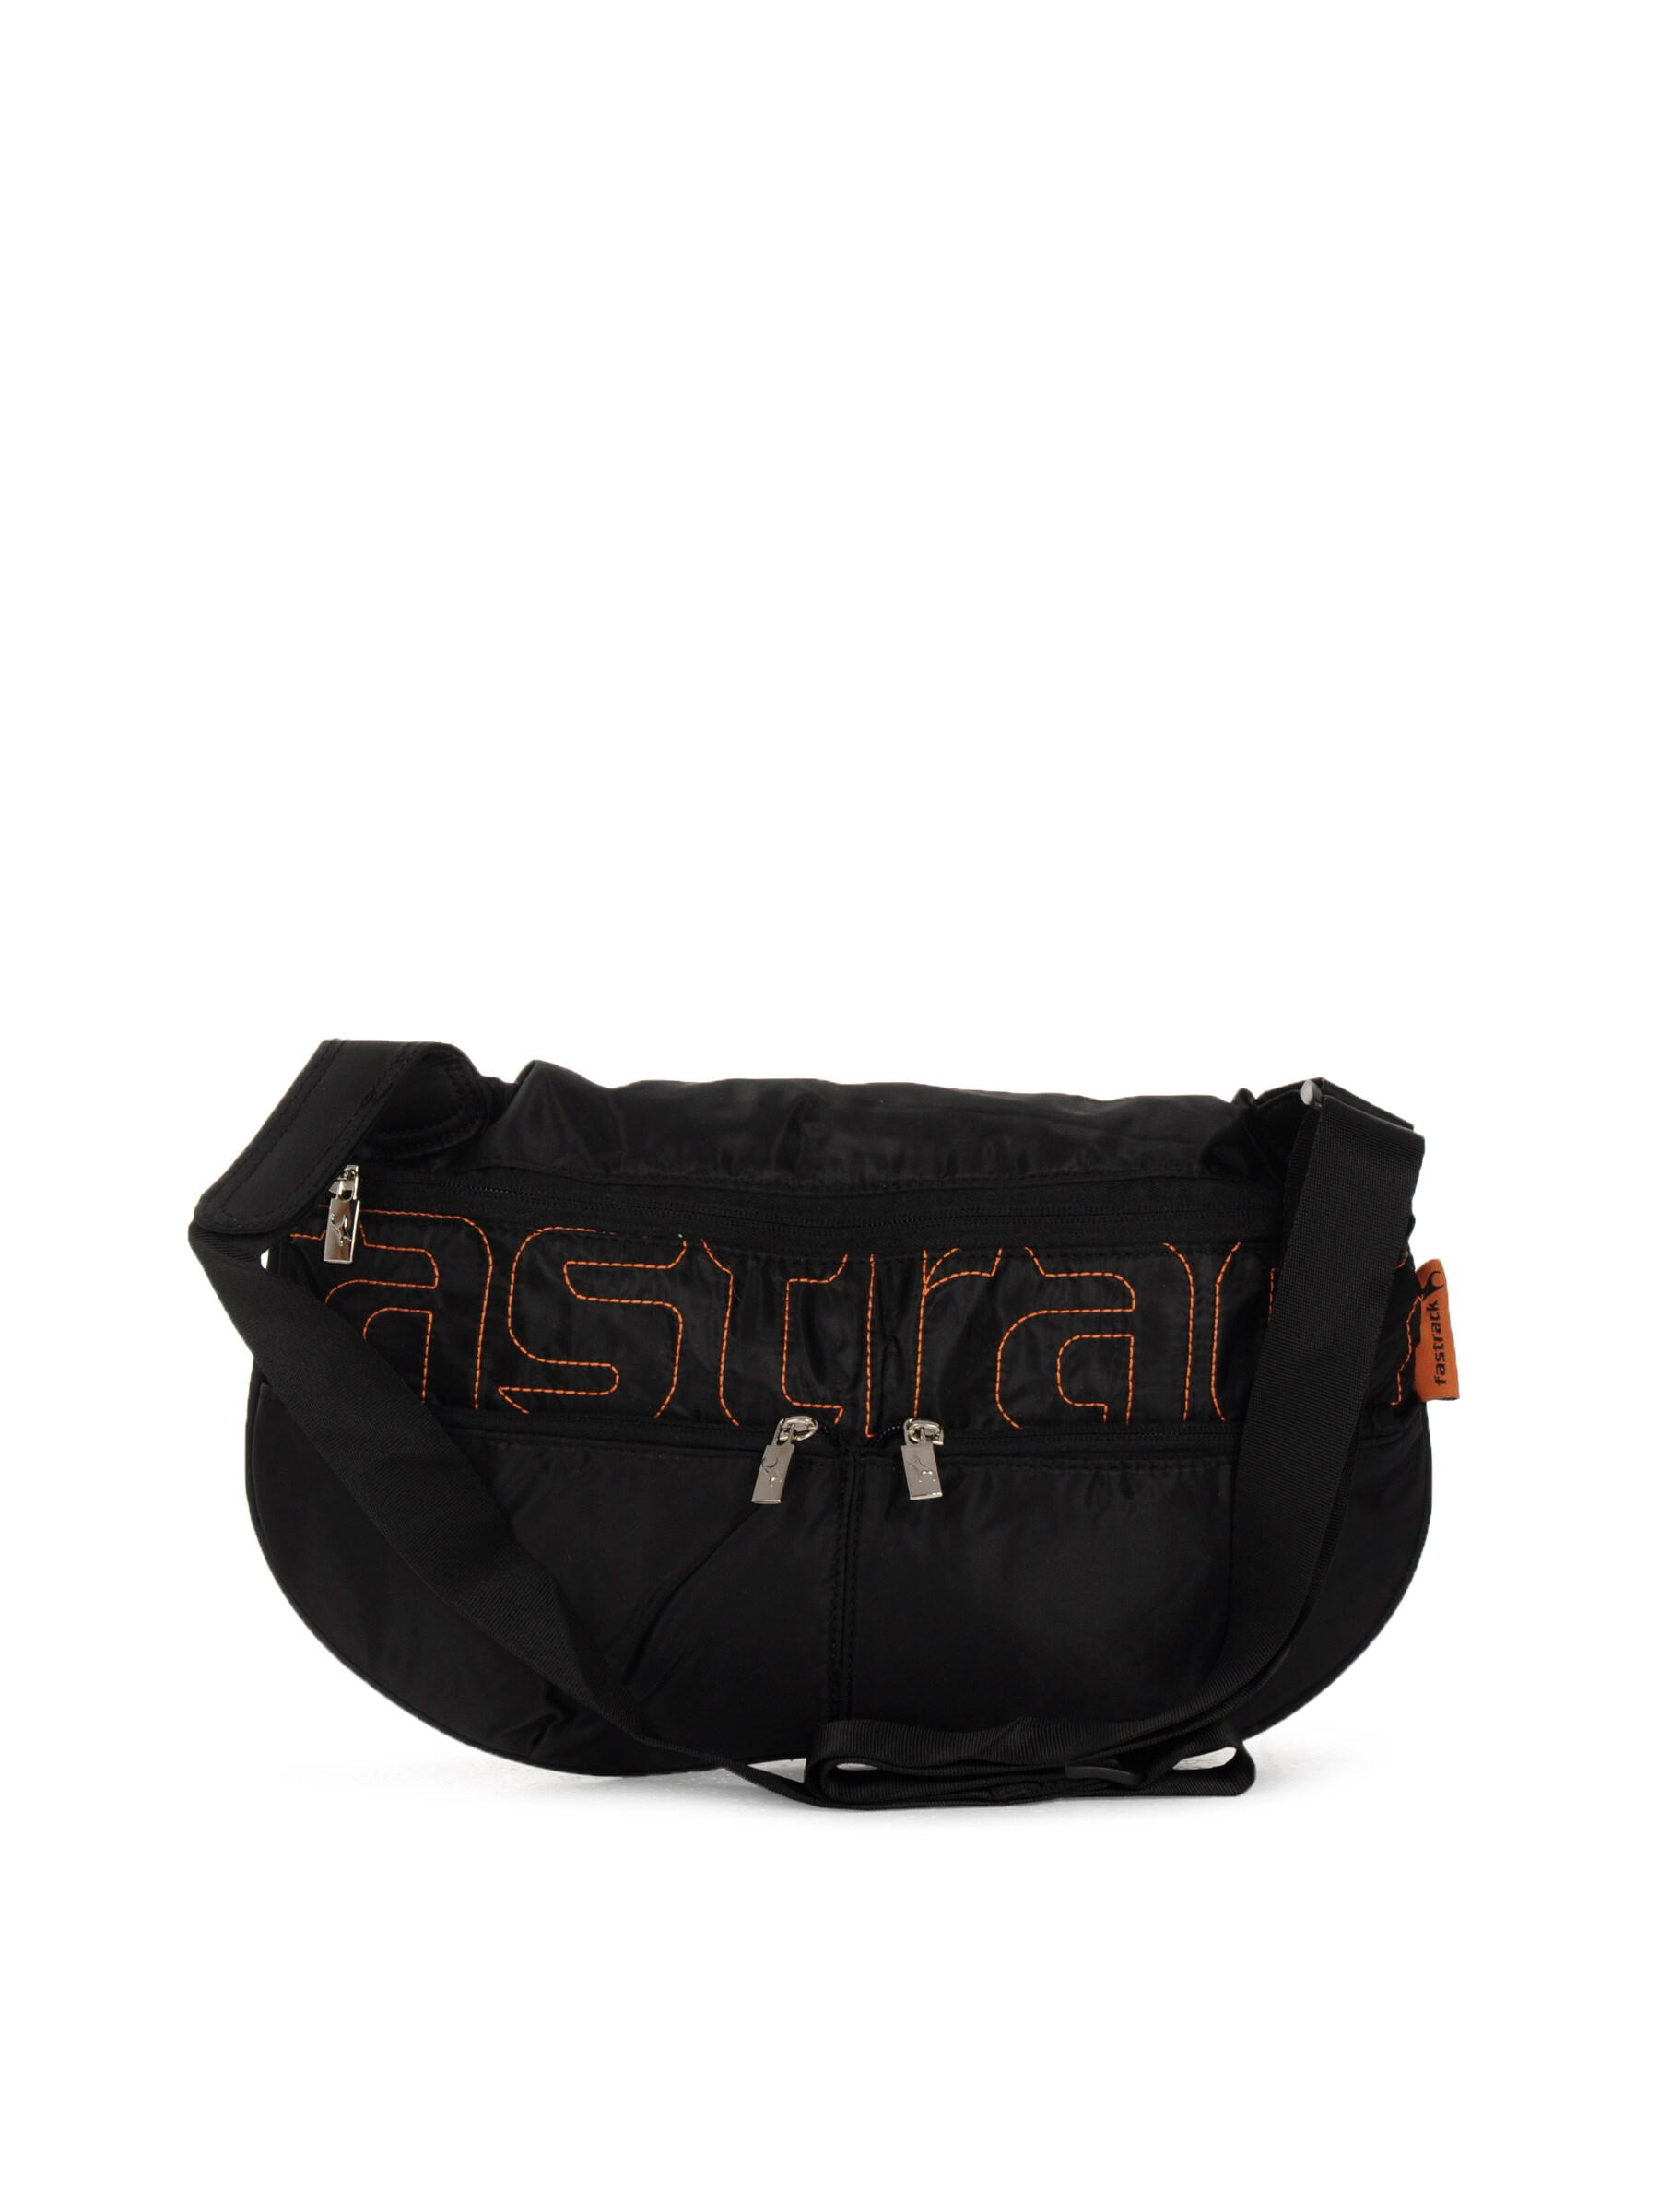 Fastrack Sling Bag Myntra | Bags More